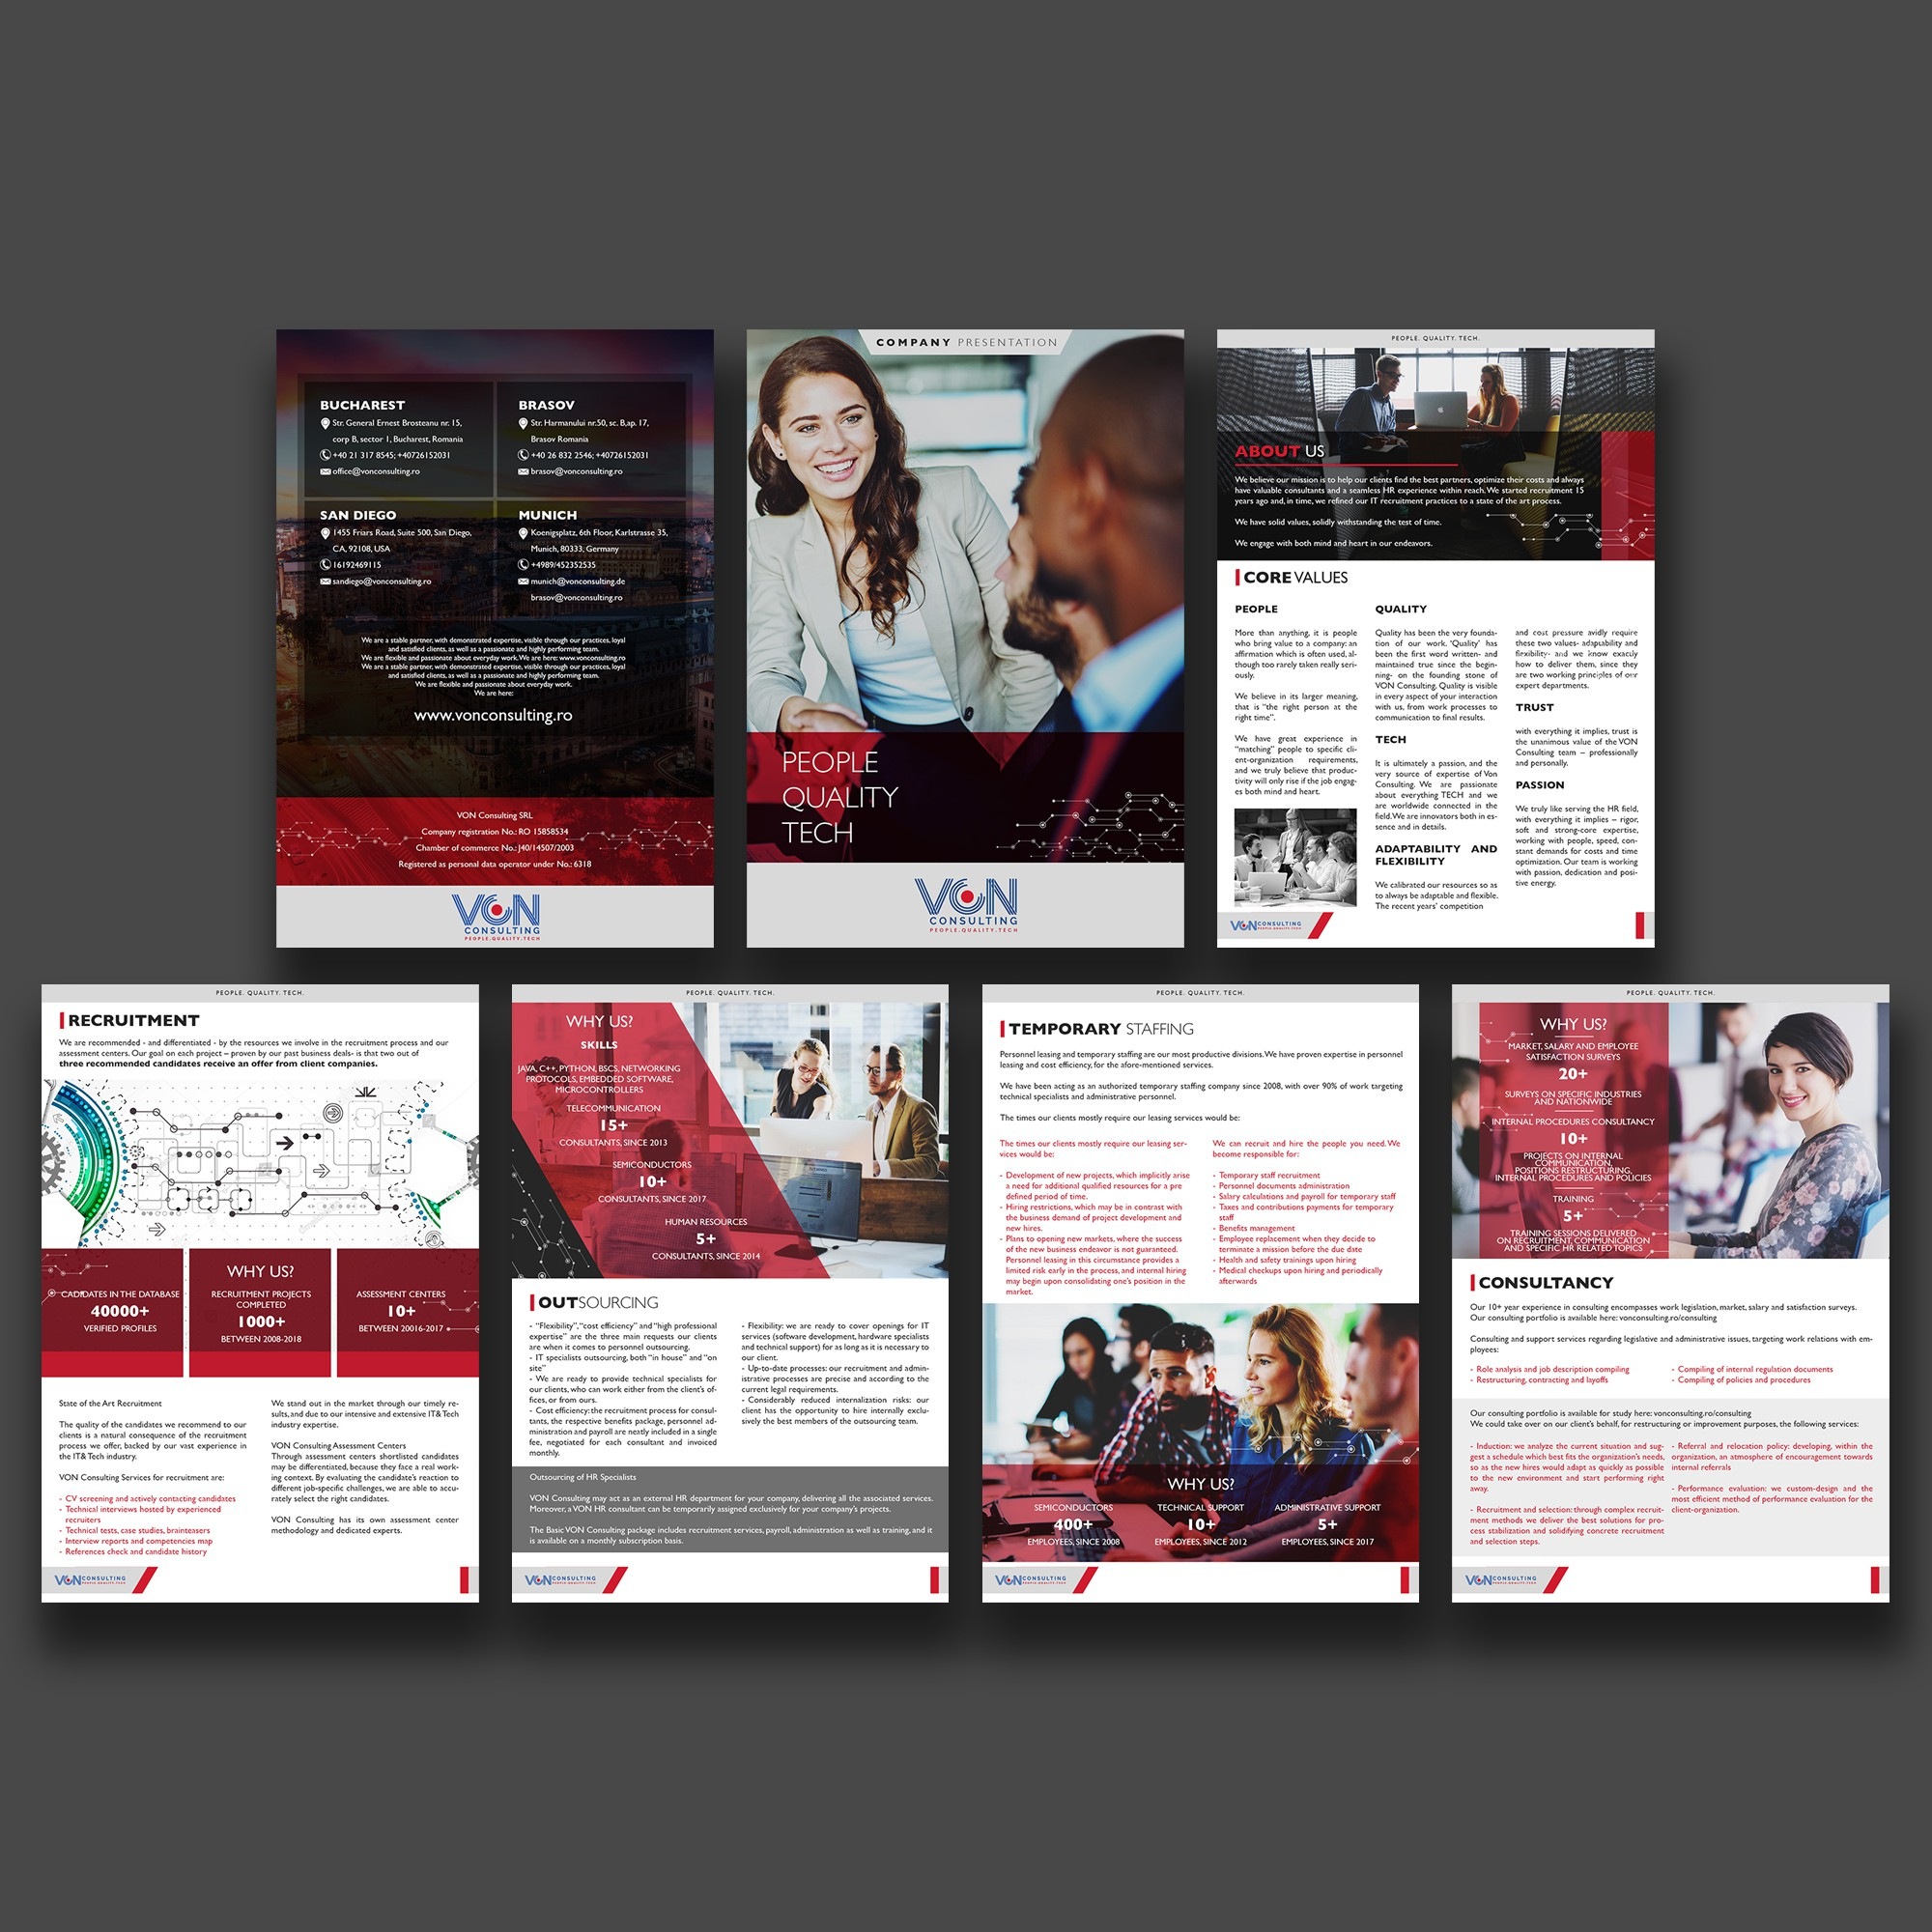 Create an Online Brochure for head hunters